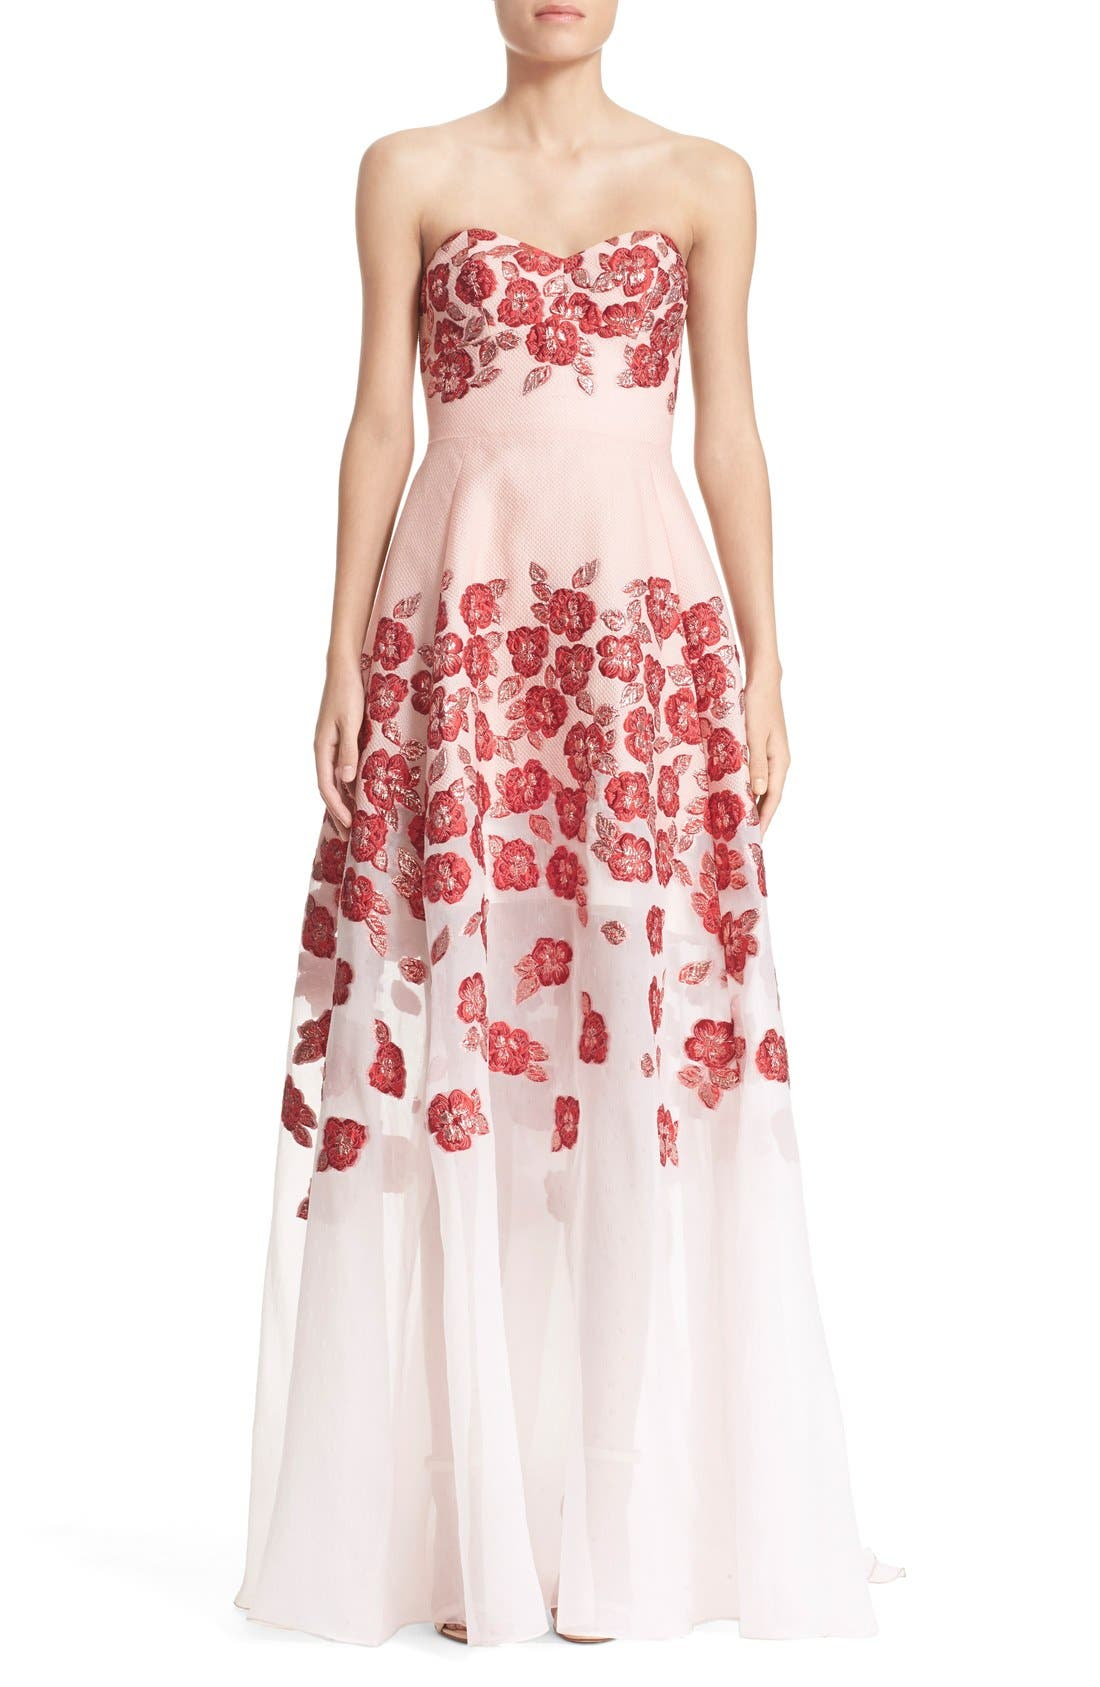 Alternate Image 1 Selected - Lela Rose Strapless Floral FilCoupéGown